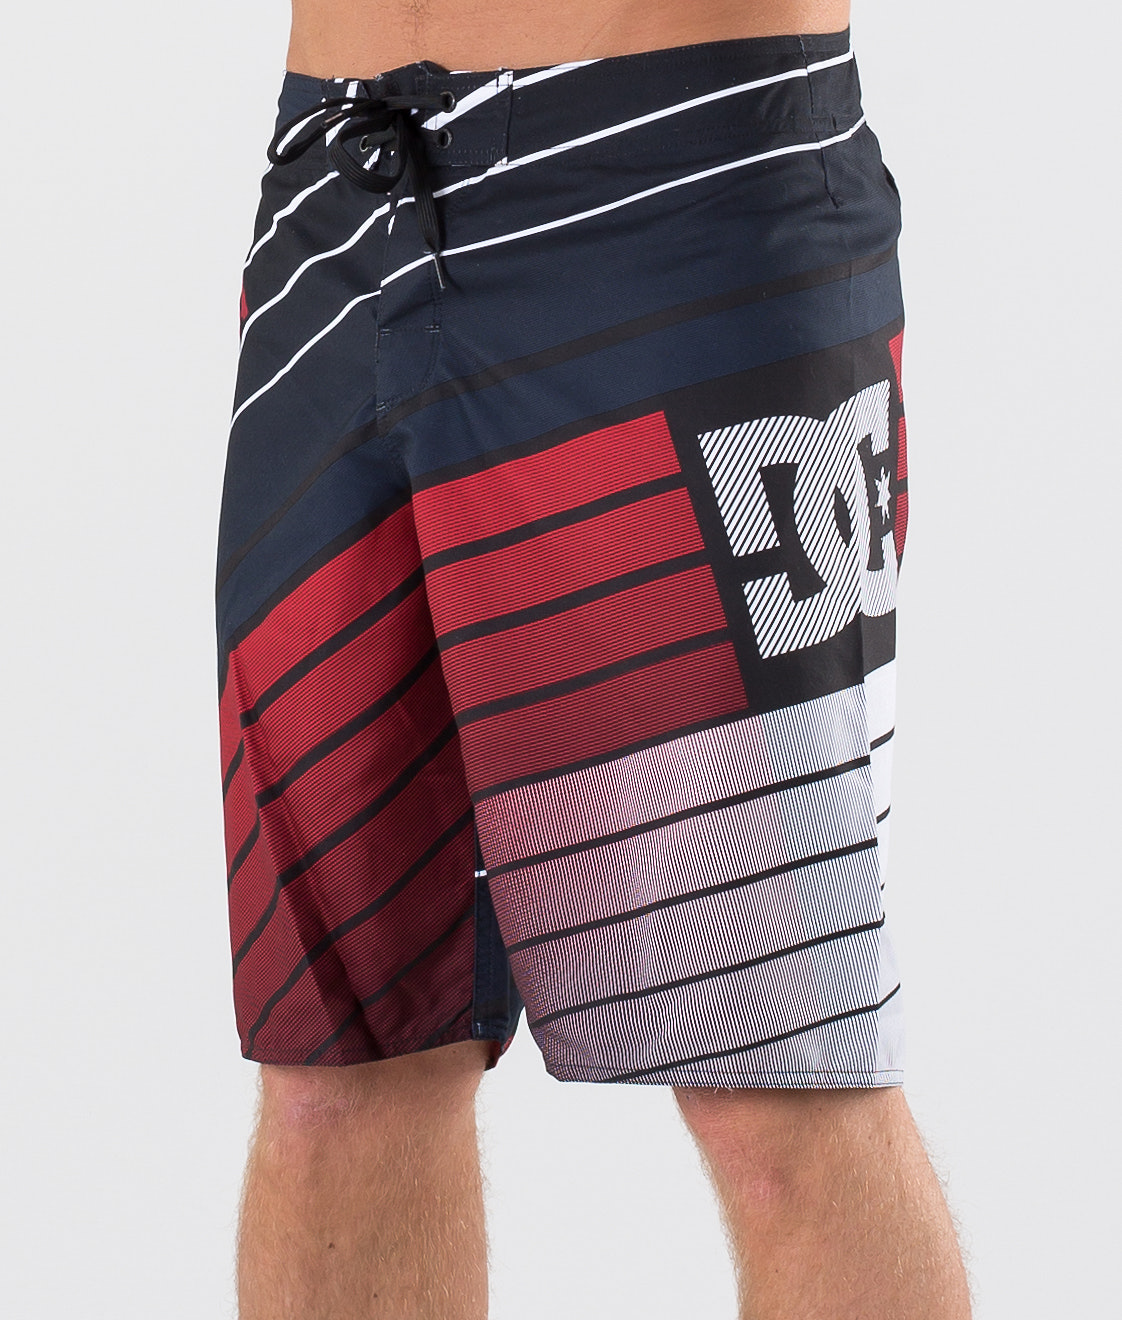 ecd83eecbb3 Men's Boardshorts | Swimwear | RIDESTORE